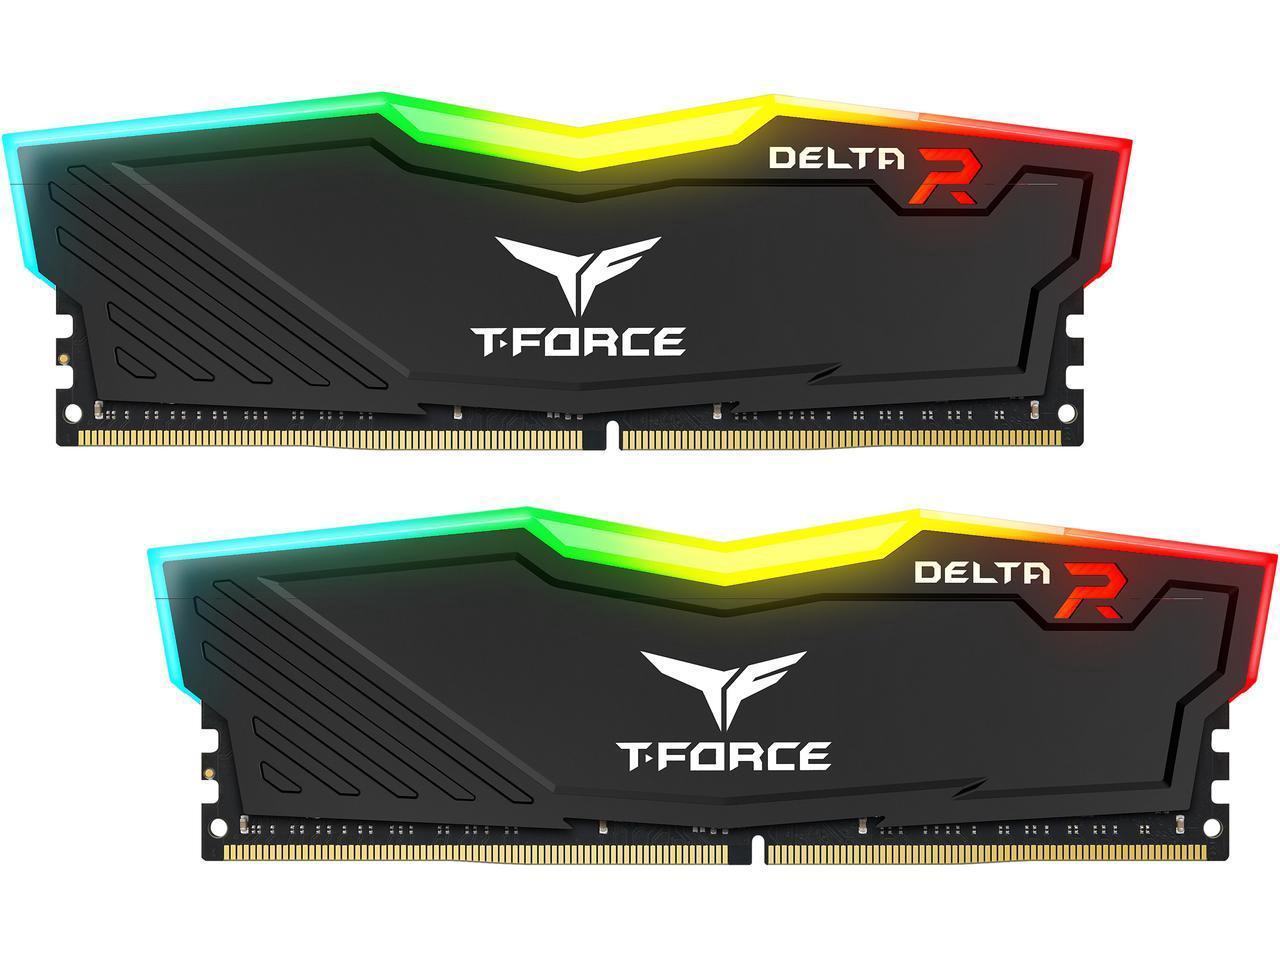 2x8GB Team T-Force Delta II RGB 2666MHz DDR4 Gaming RAM image